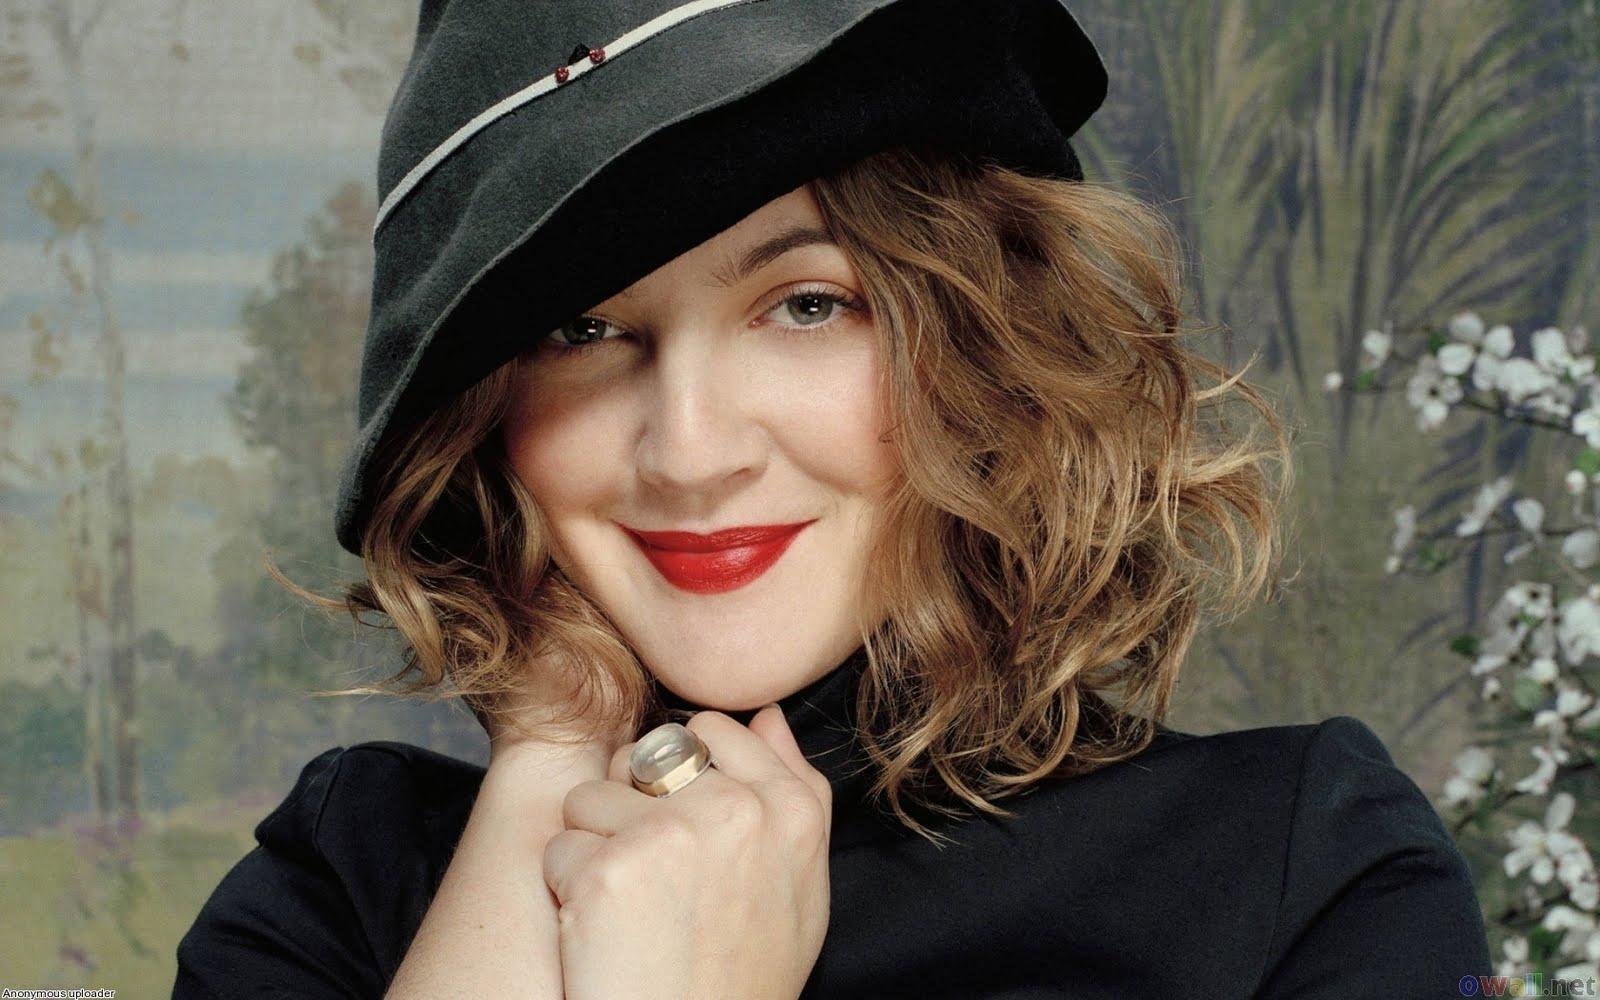 http://2.bp.blogspot.com/-okCIsSOw6vs/Te1ERq78M-I/AAAAAAAABp8/blm1dXgkfR4/s1600/American+Actress+Hayden+Panettiere+Beautiful+Photos+%252810%2529.jpg